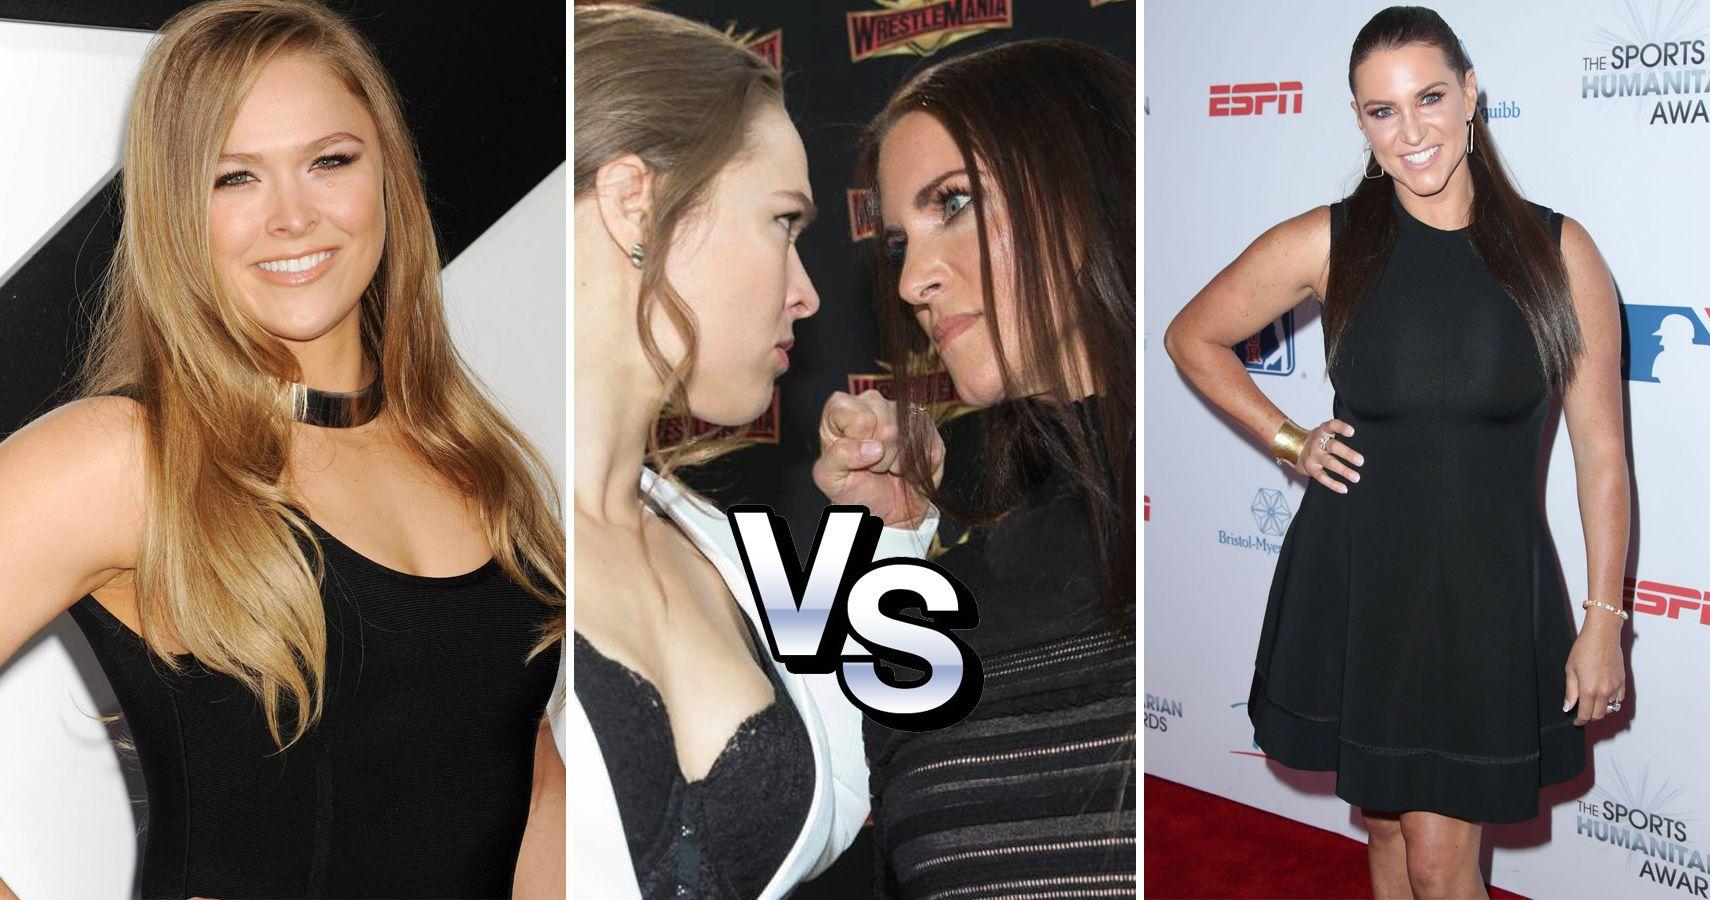 Ronda Rousey Vs Stephanie Mcmahon Whos More Attractive